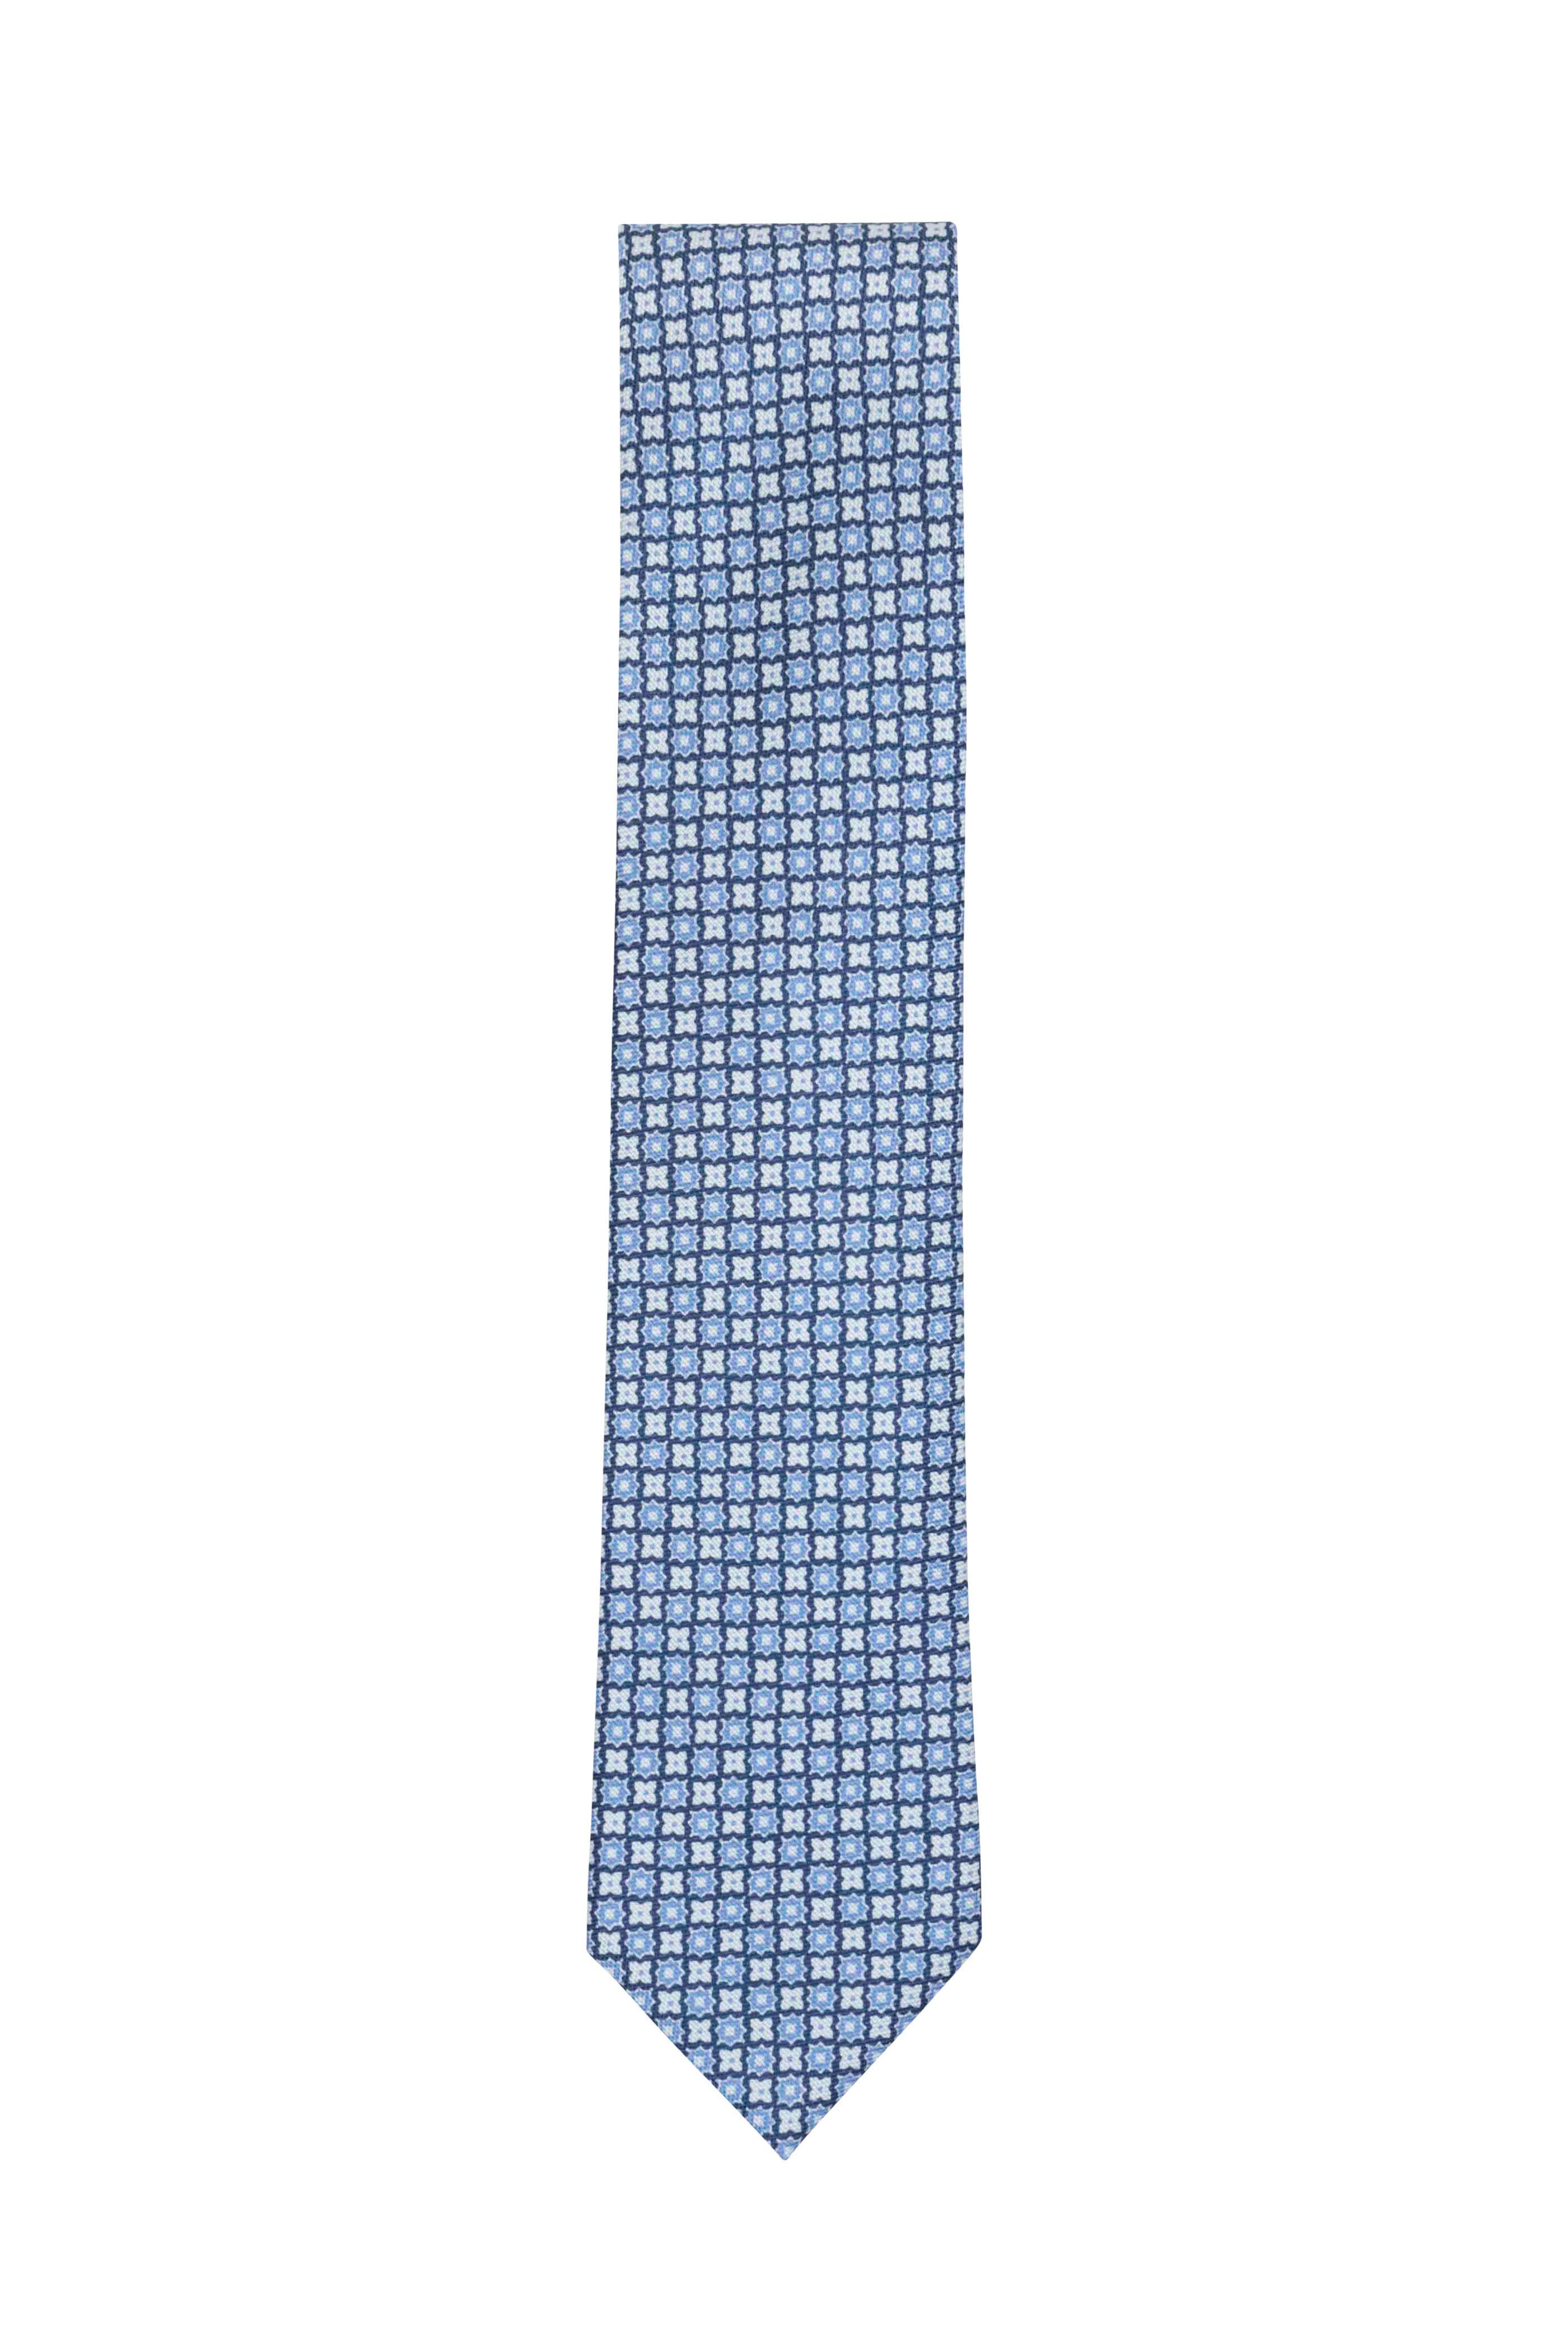 e2f5aa25 Ermenegildo Zegna - Blue & White Floral Silk Necktie   Mitchell Stores